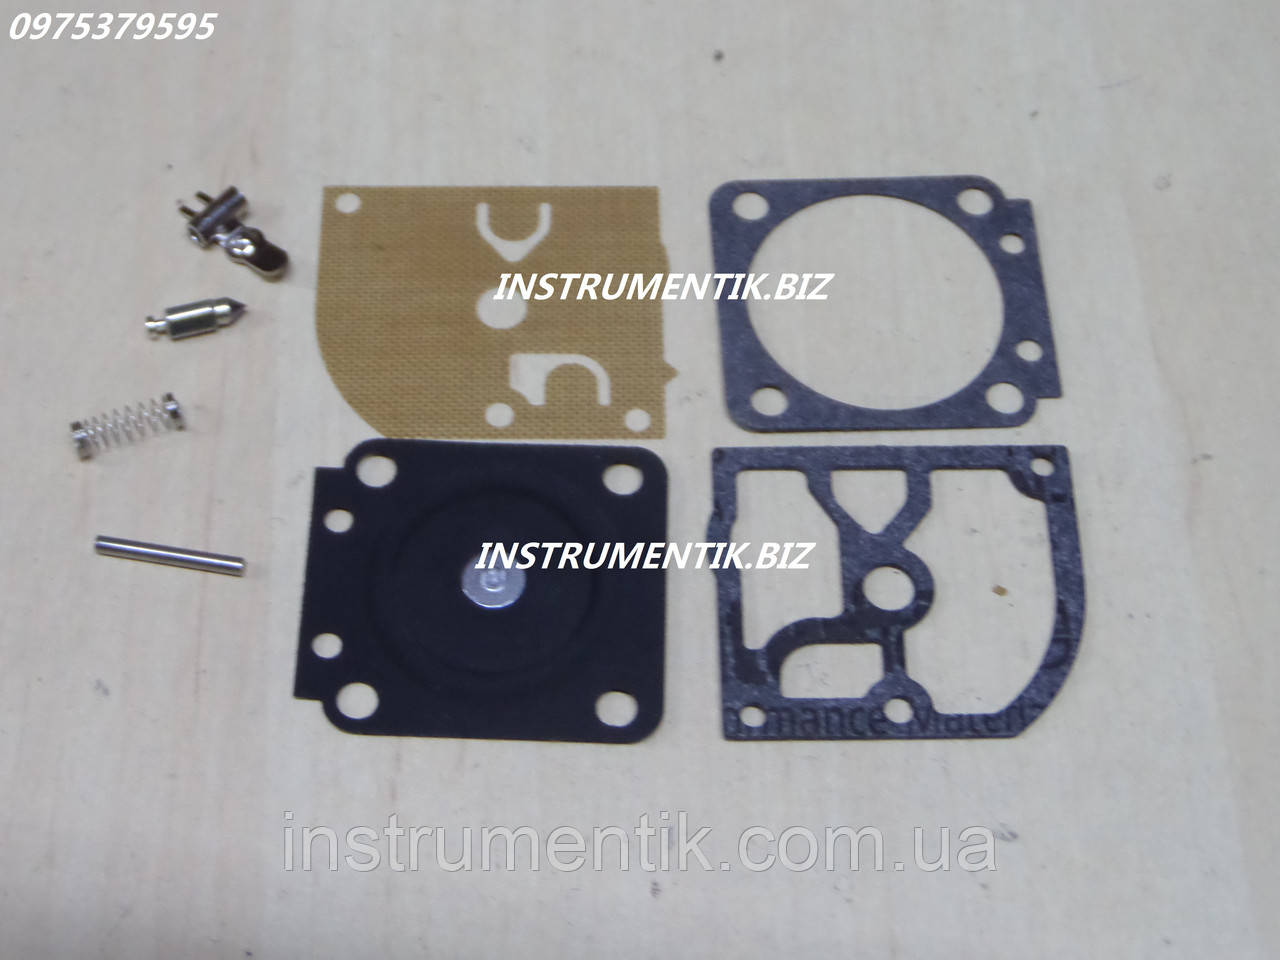 Ремкомплект карбюратора для Stihl FS 120, FS 200, FS 250